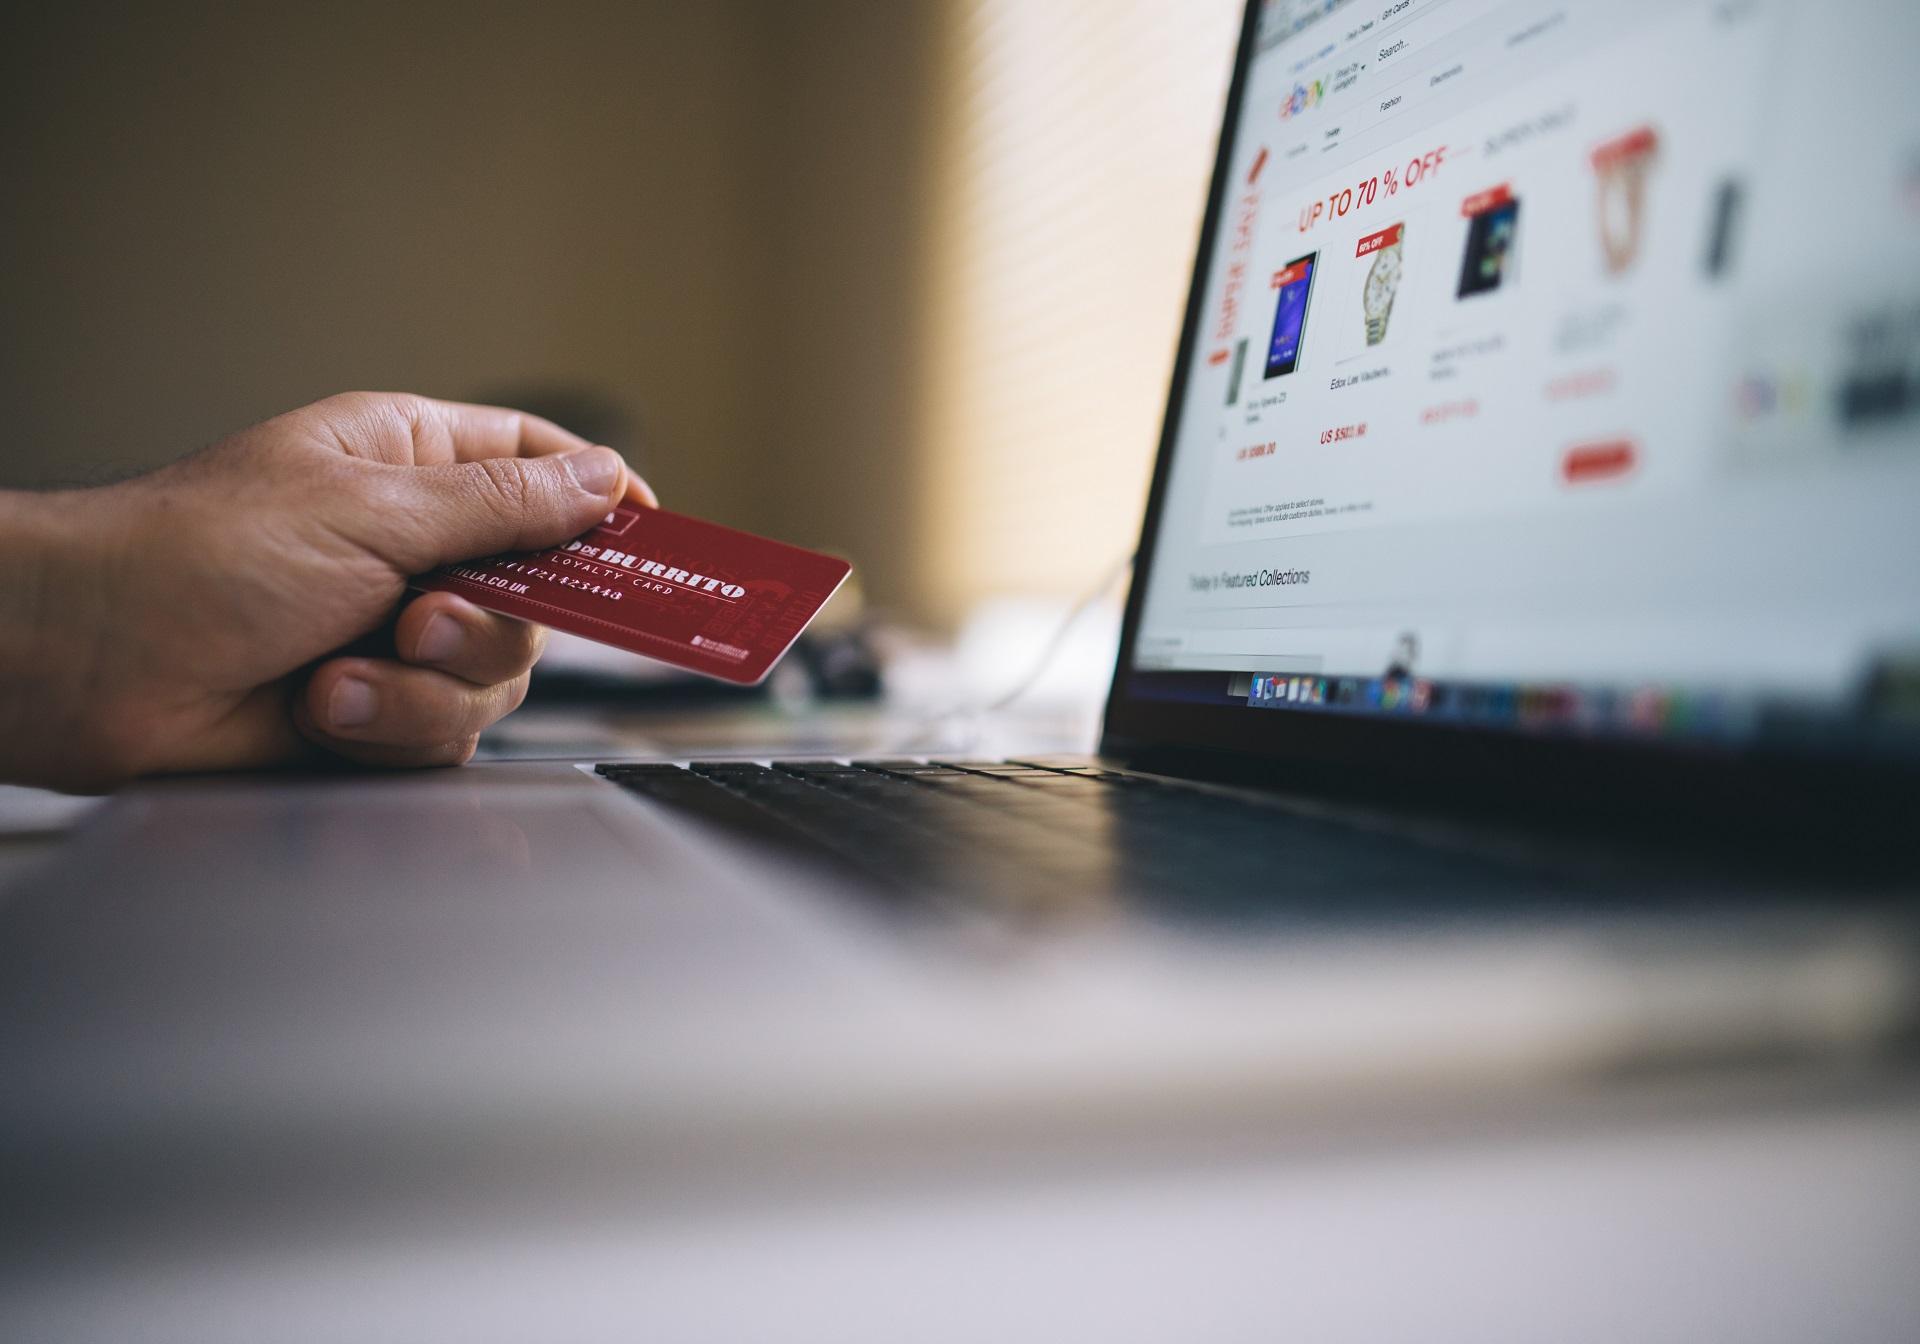 pexels-photoESKM Credit Card resize